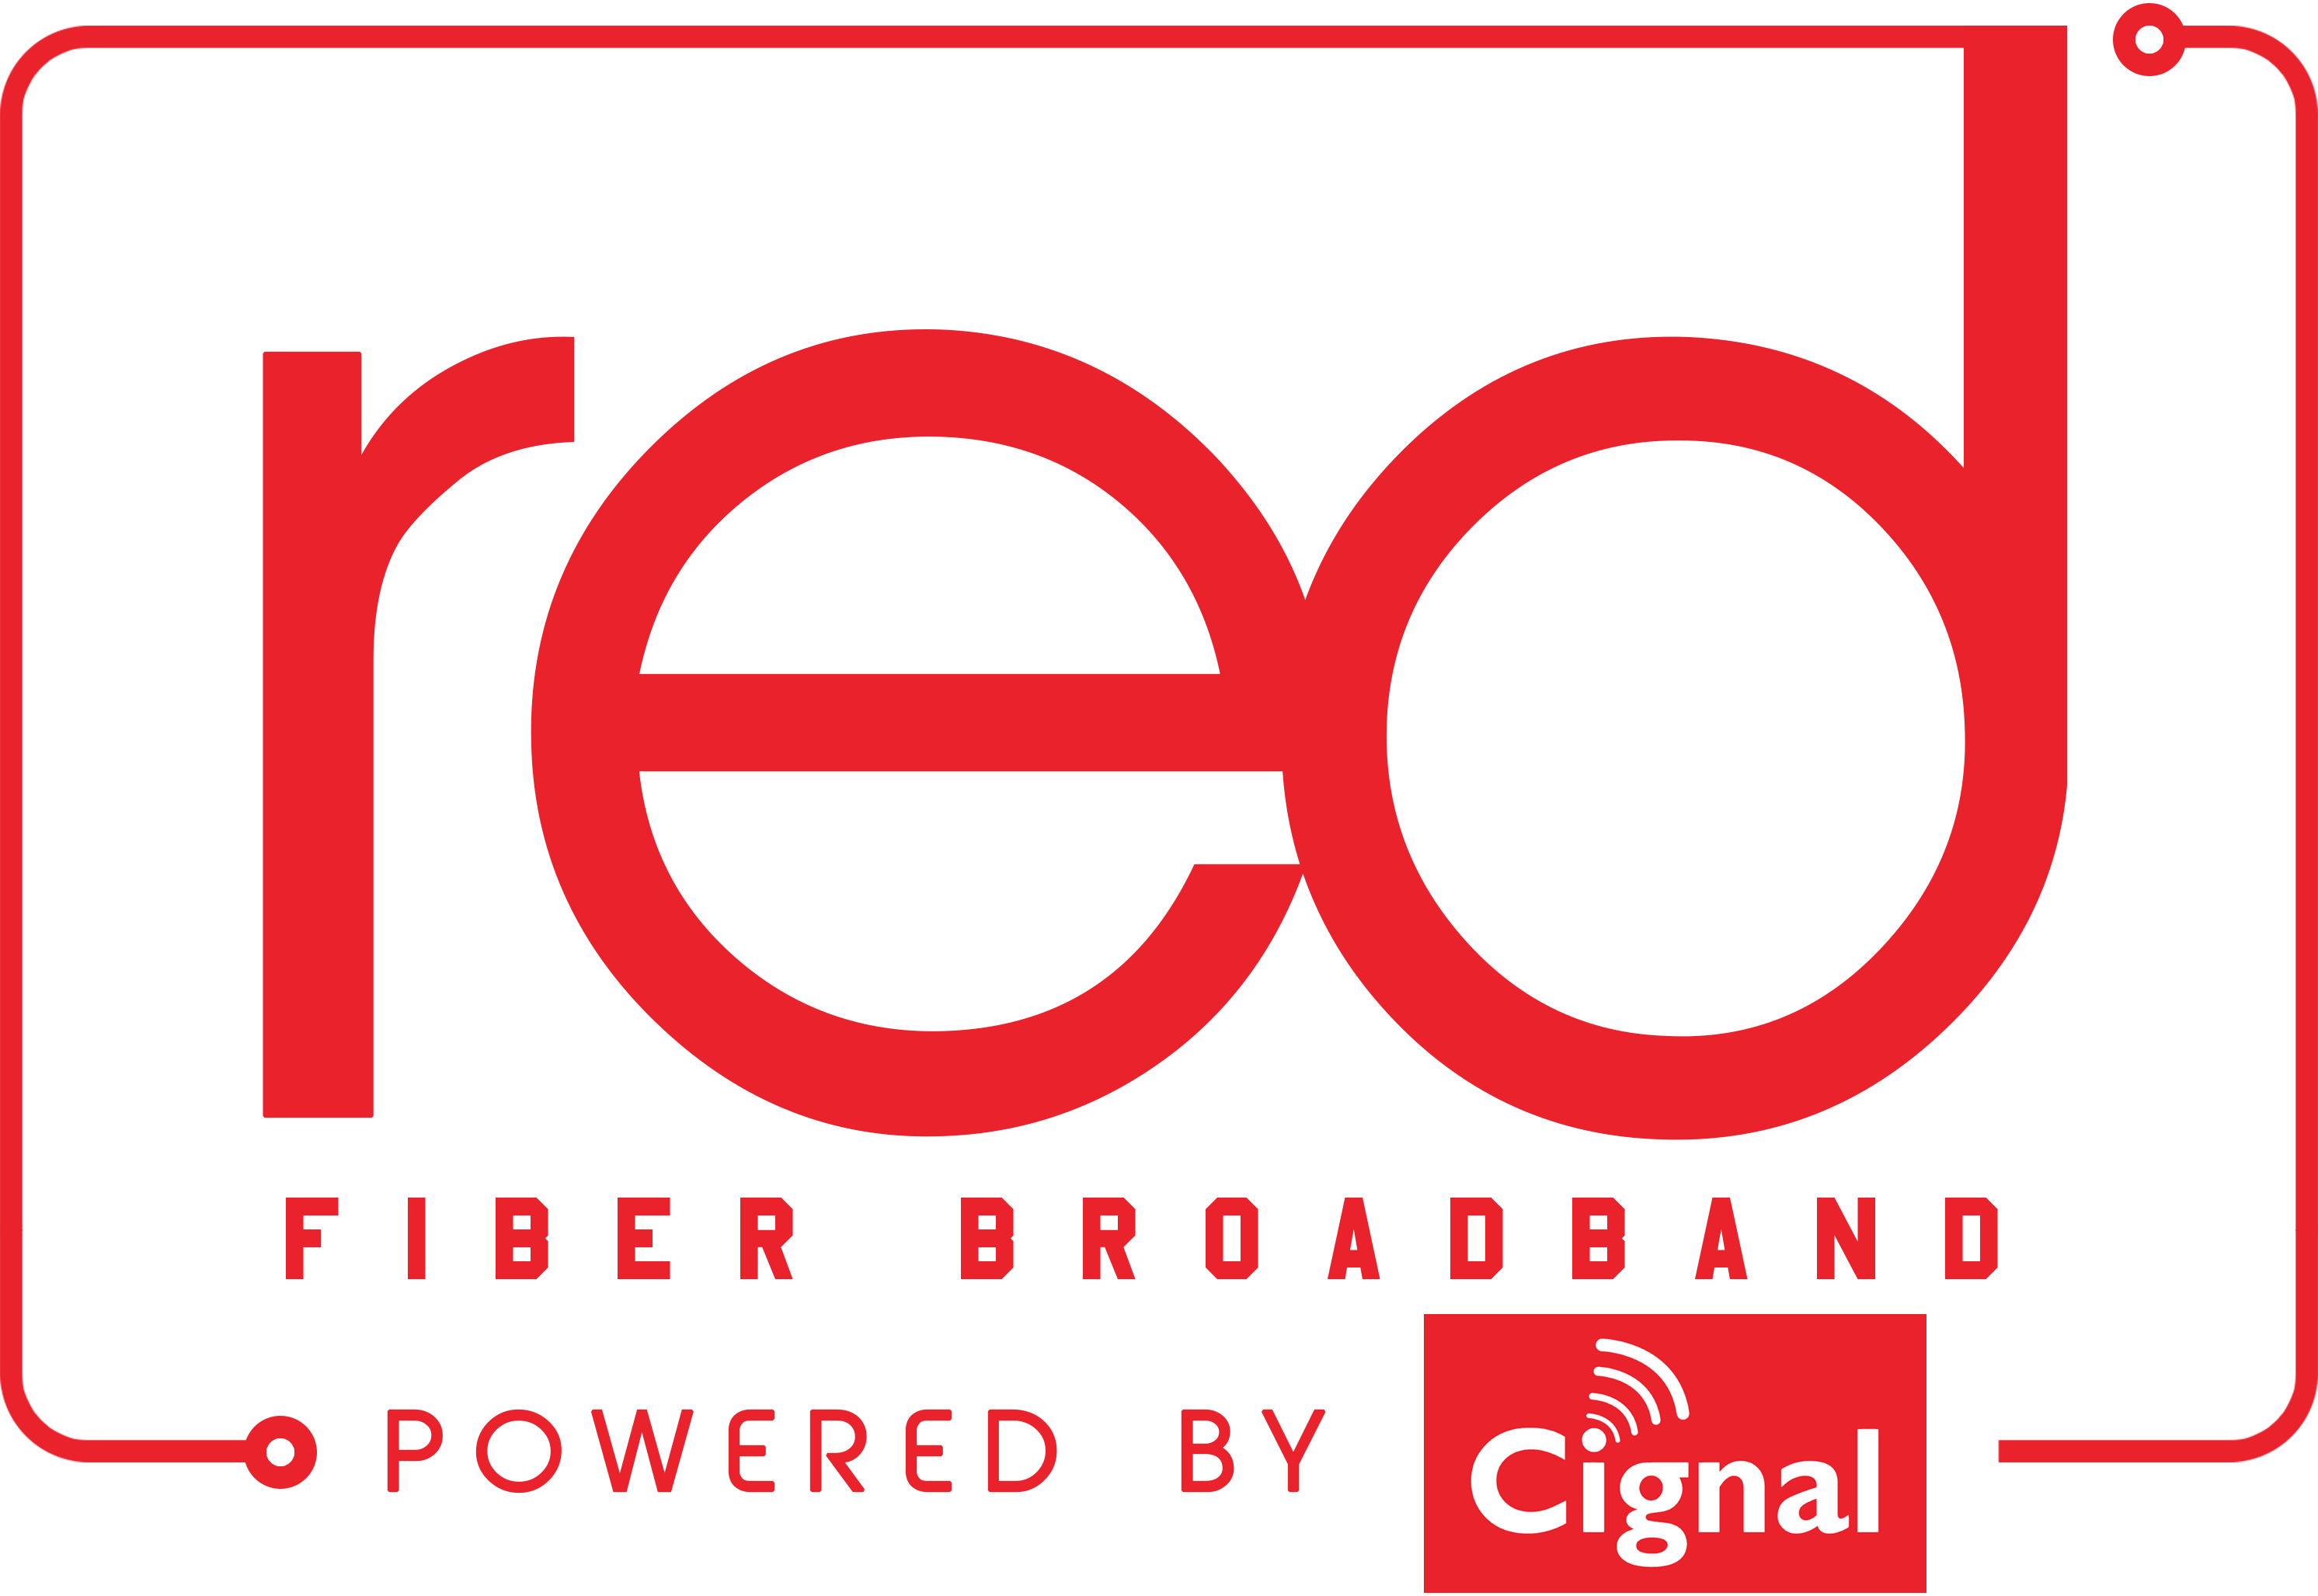 Red Broadband